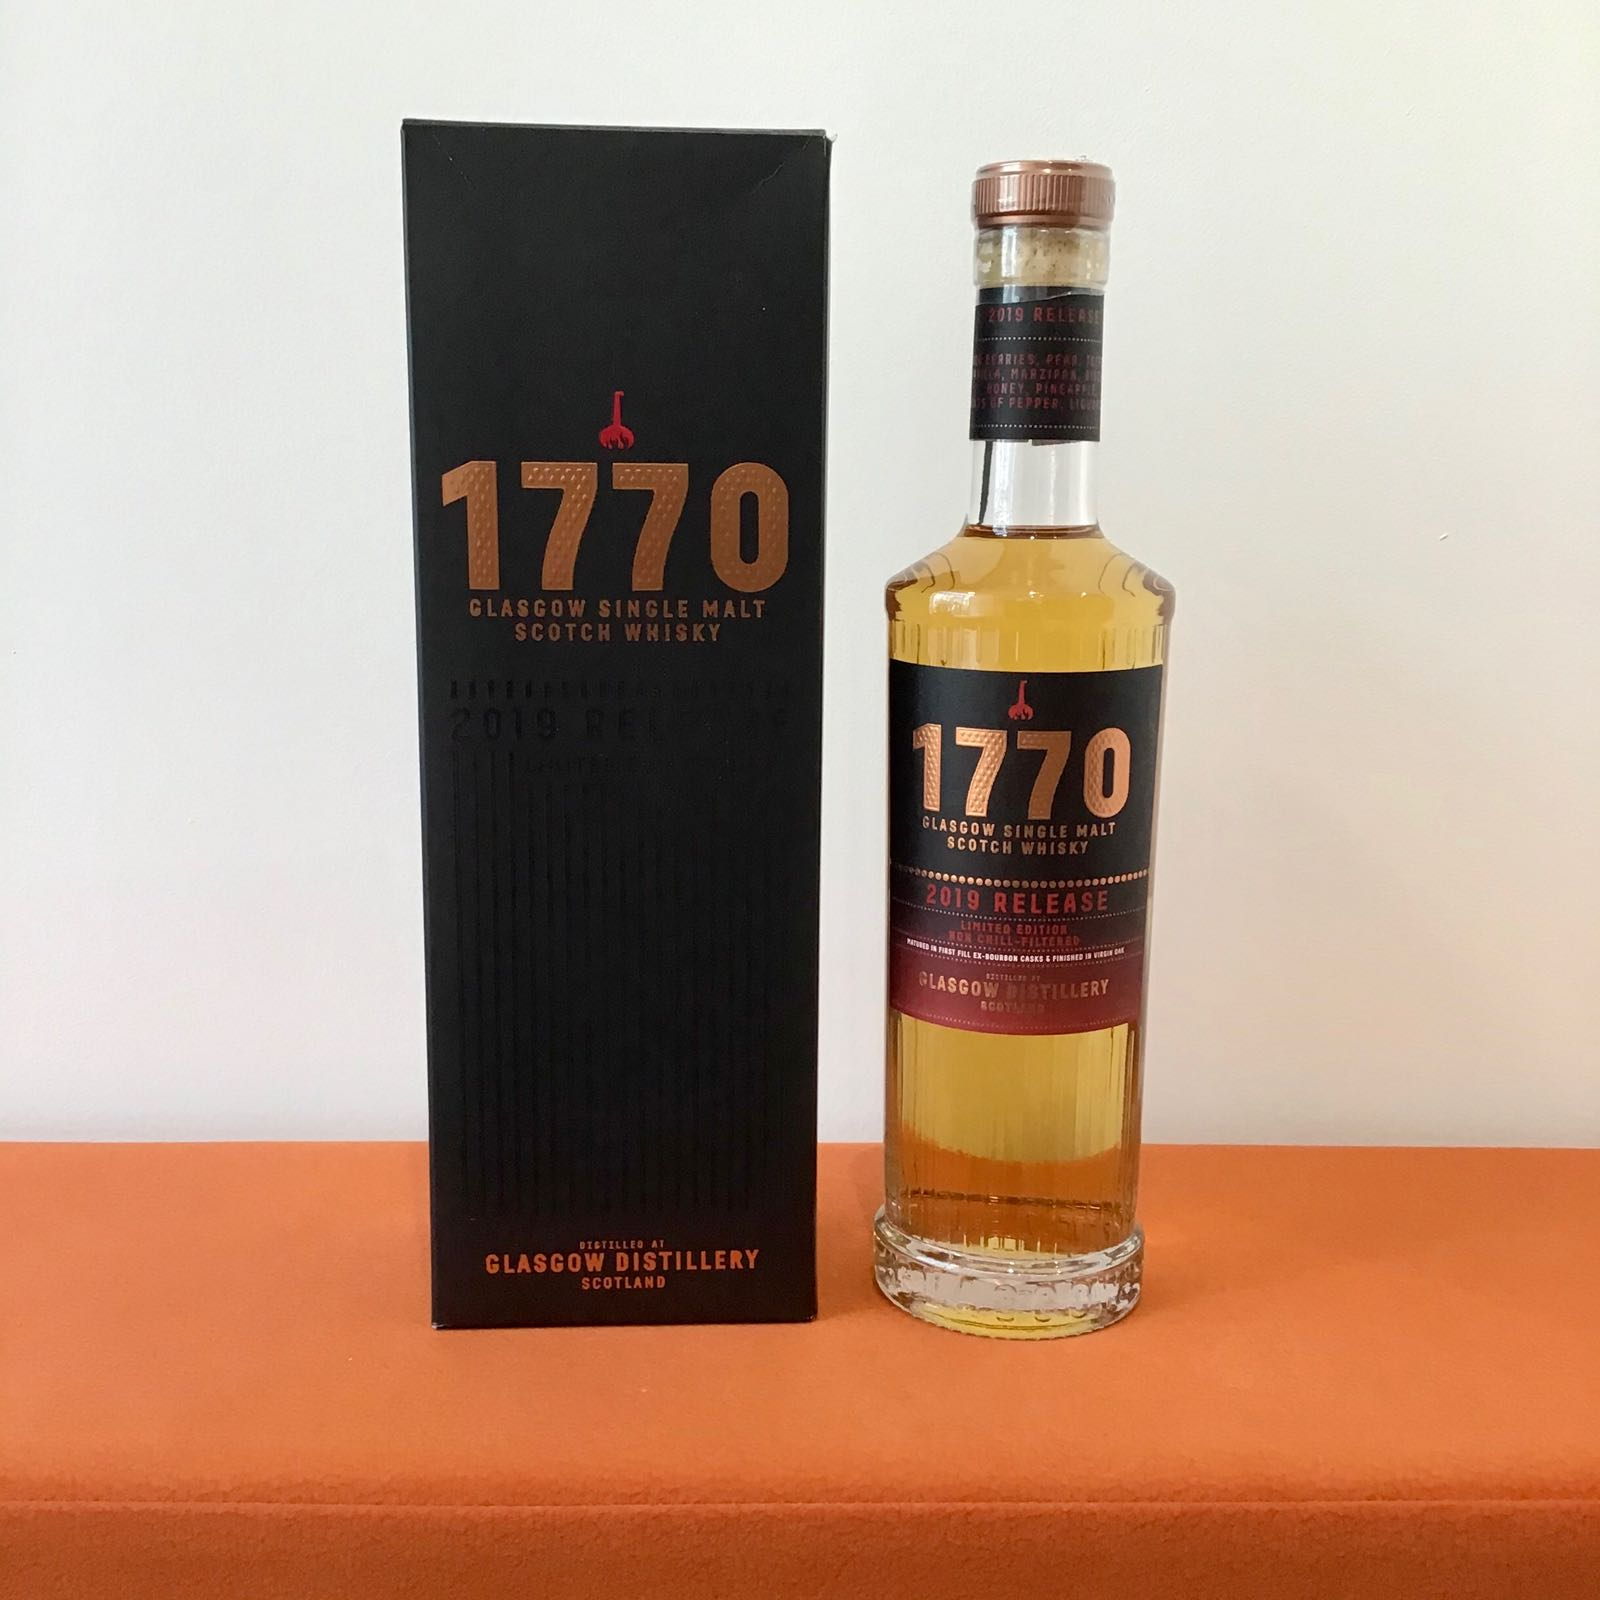 Glasgow Distillery 1770 (2019 release)